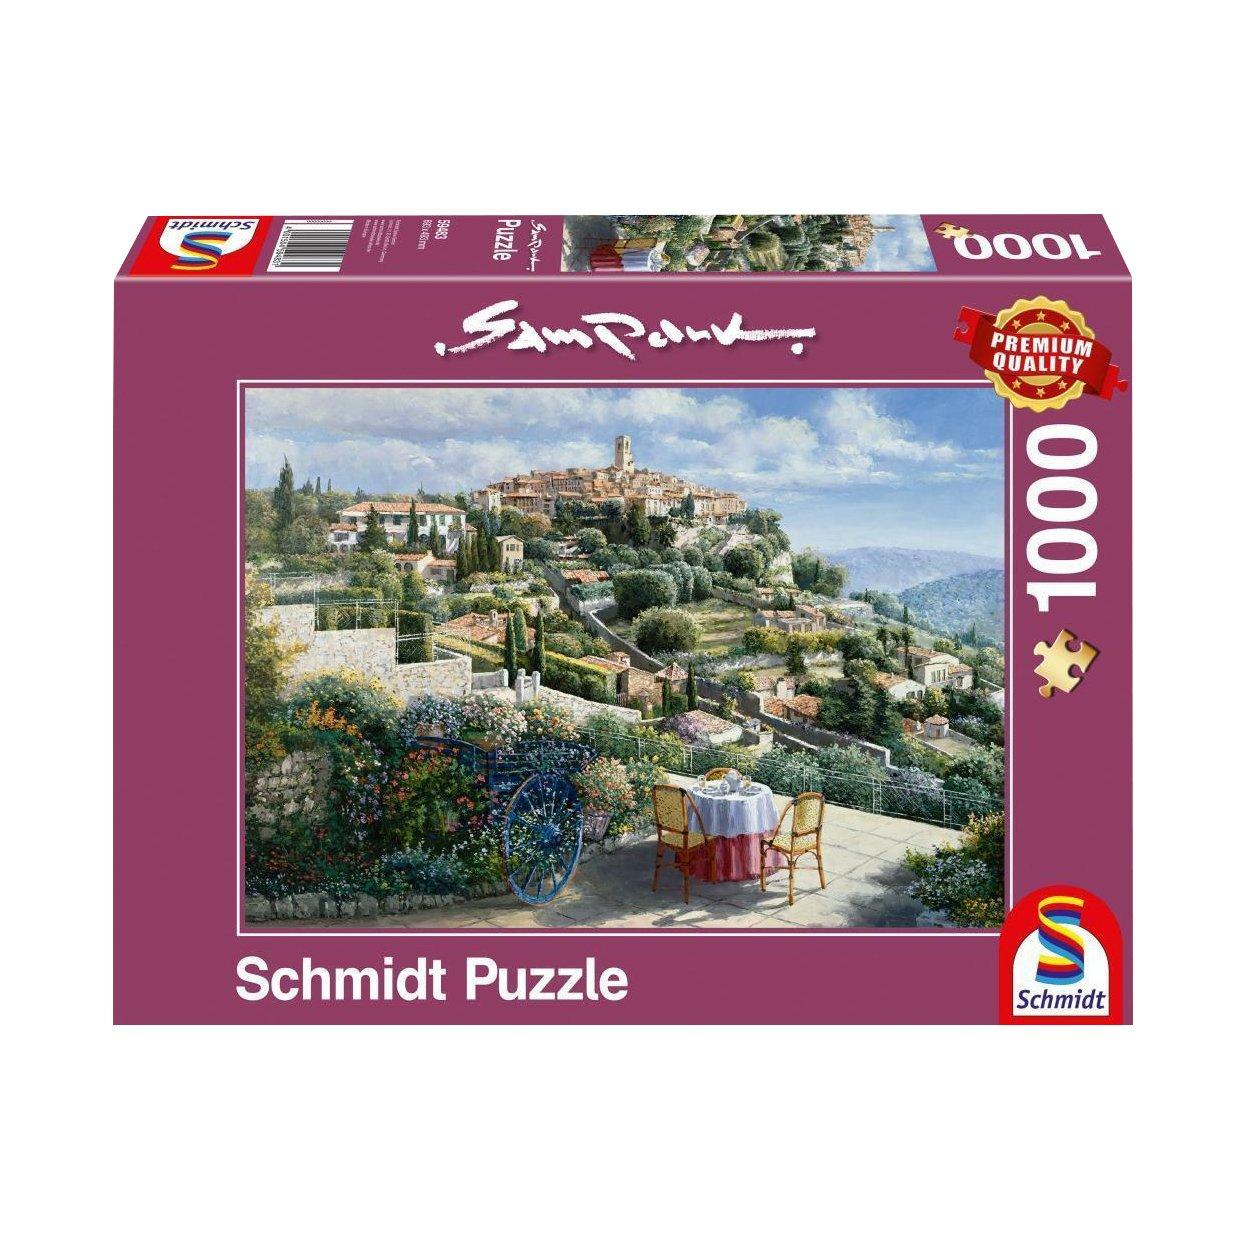 St. Paul Paul de Vence - Puzzle Sam Puzzle Park St. 1000 Teile B074TP853S, ヤマギワ (yamagiwa ):627a6ba9 --- sharoshka.org